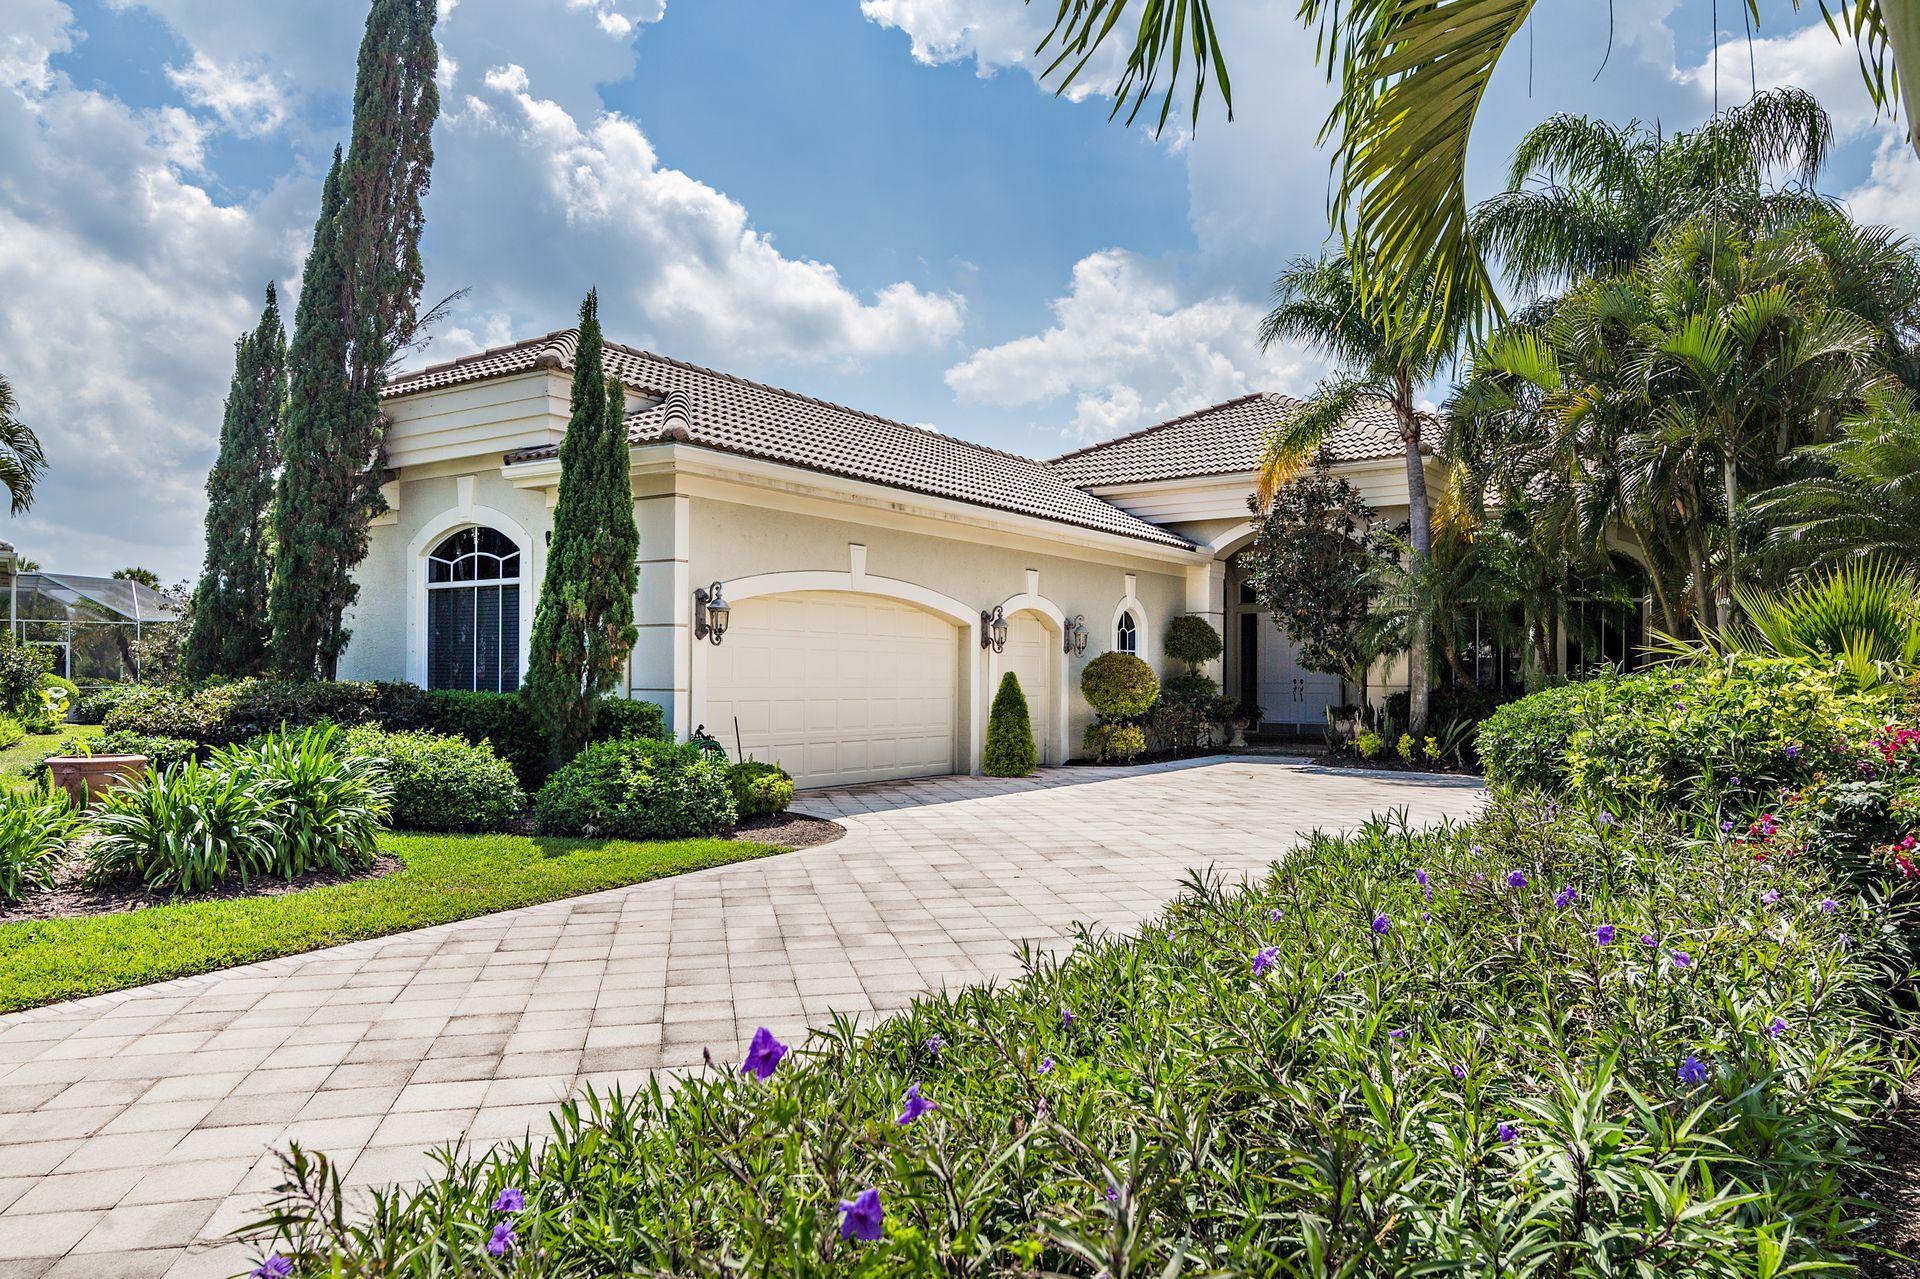 6788 Oakmont Way, West Palm Beach, Florida 33412, 3 Bedrooms Bedrooms, ,3 BathroomsBathrooms,A,Single family,Oakmont,RX-10613555